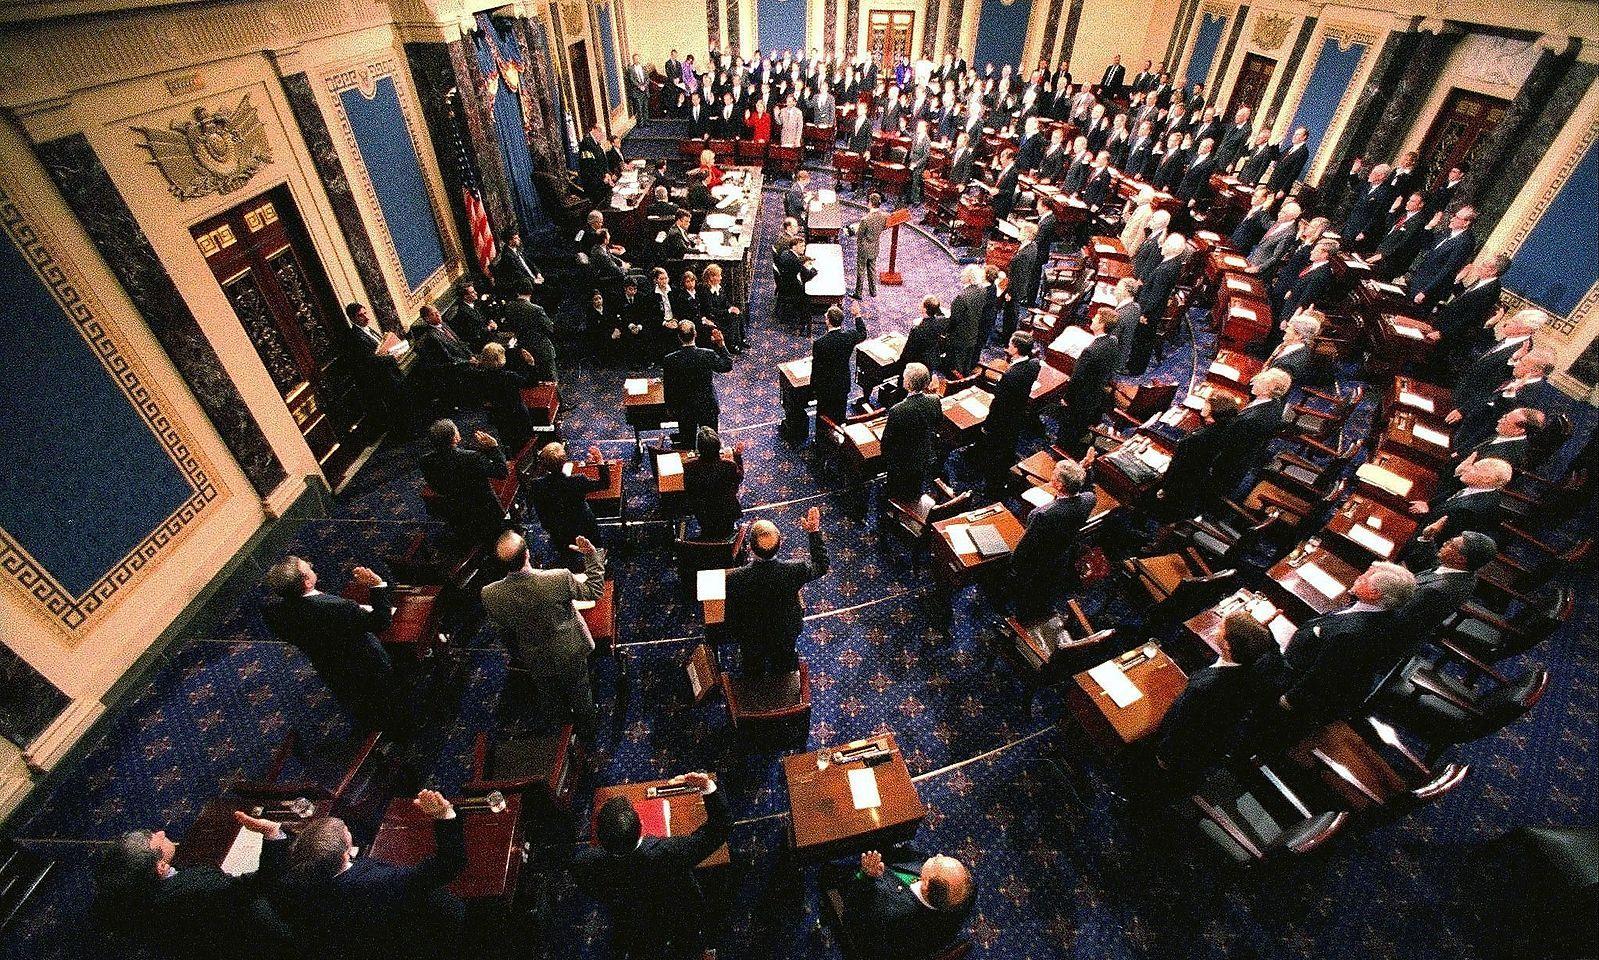 Impeachment rückt näher: Demokraten formulieren Anklagepunkte gegen Trump